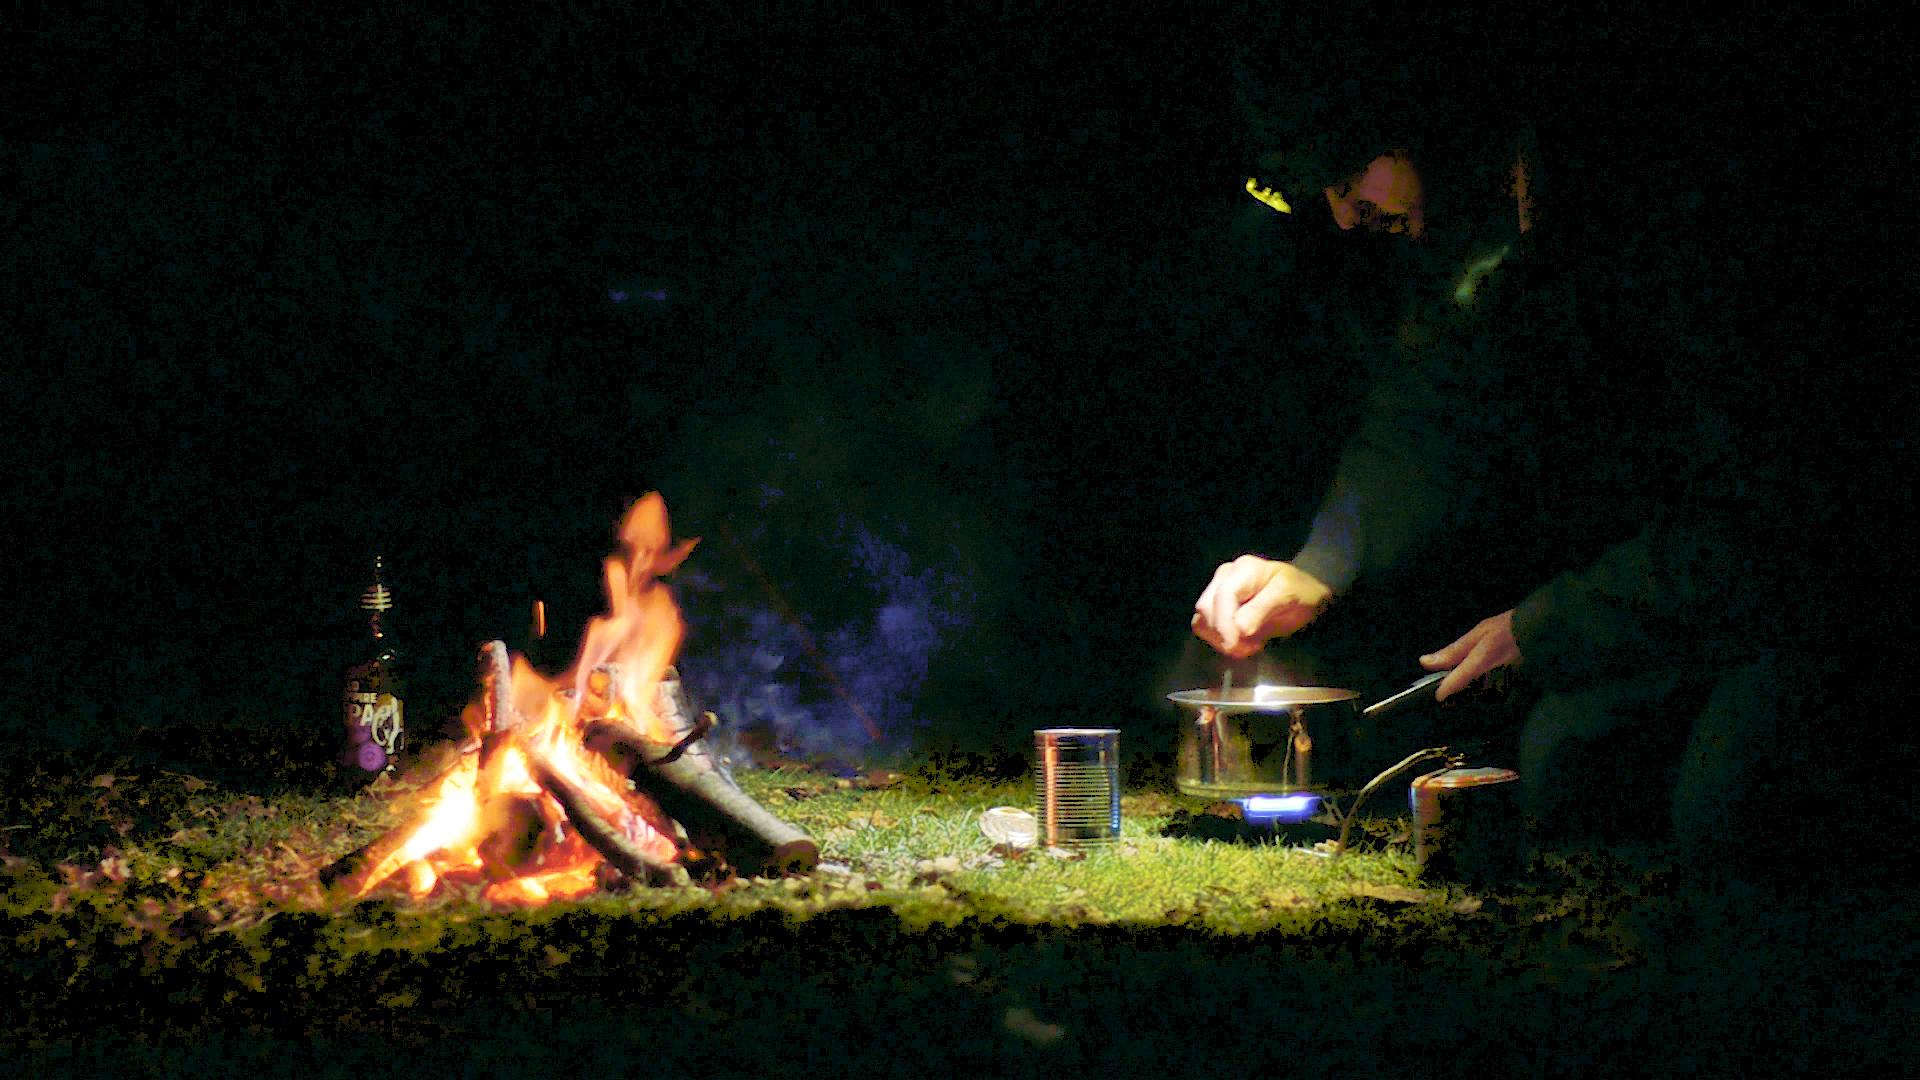 VALO_Video SS_Camping.jpg